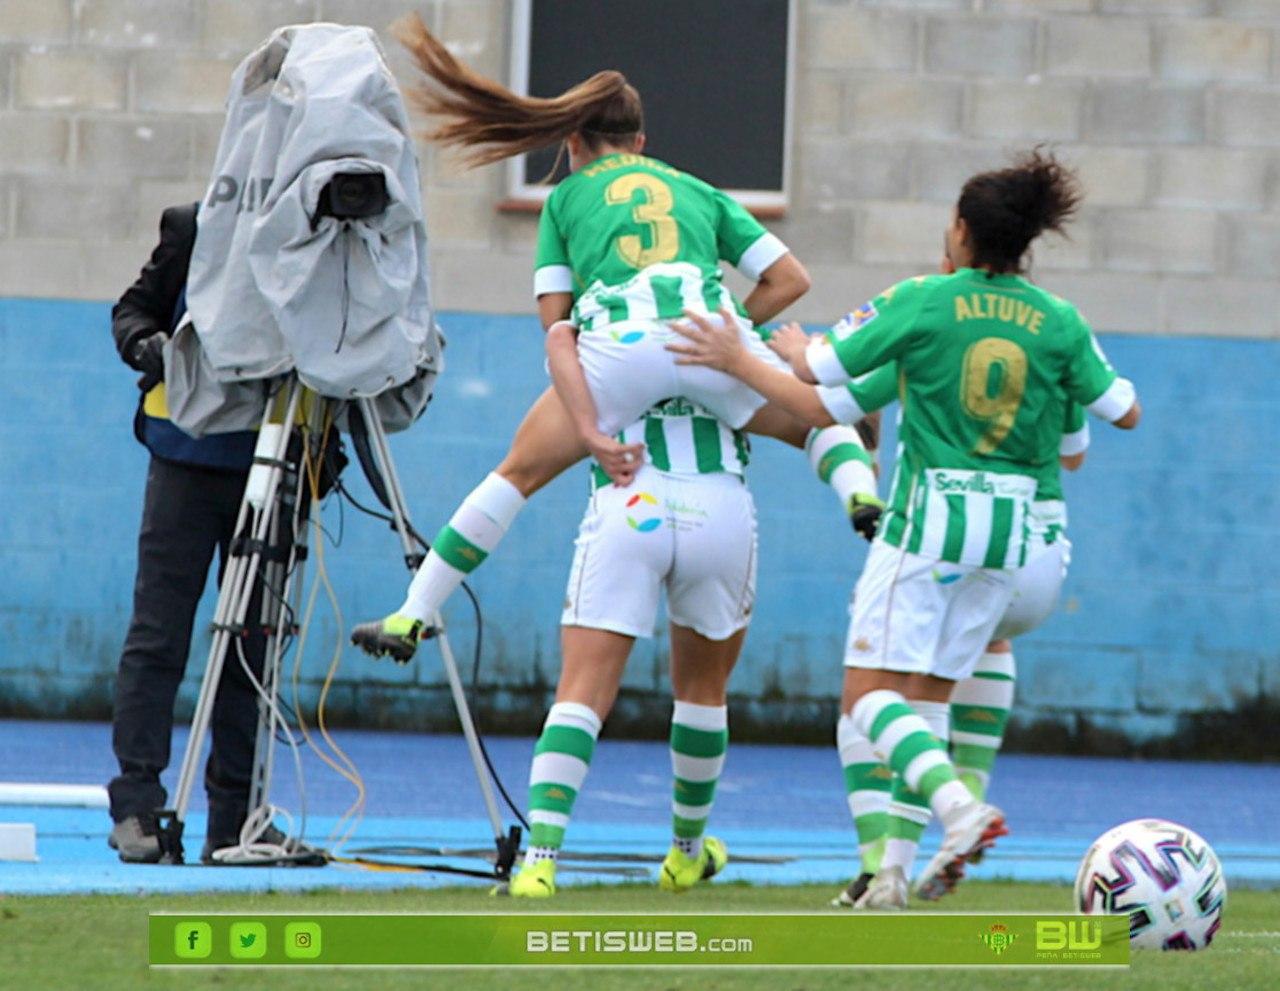 aJ19-Real-Betis-Fem-vs-Sporting-de-Huelva140